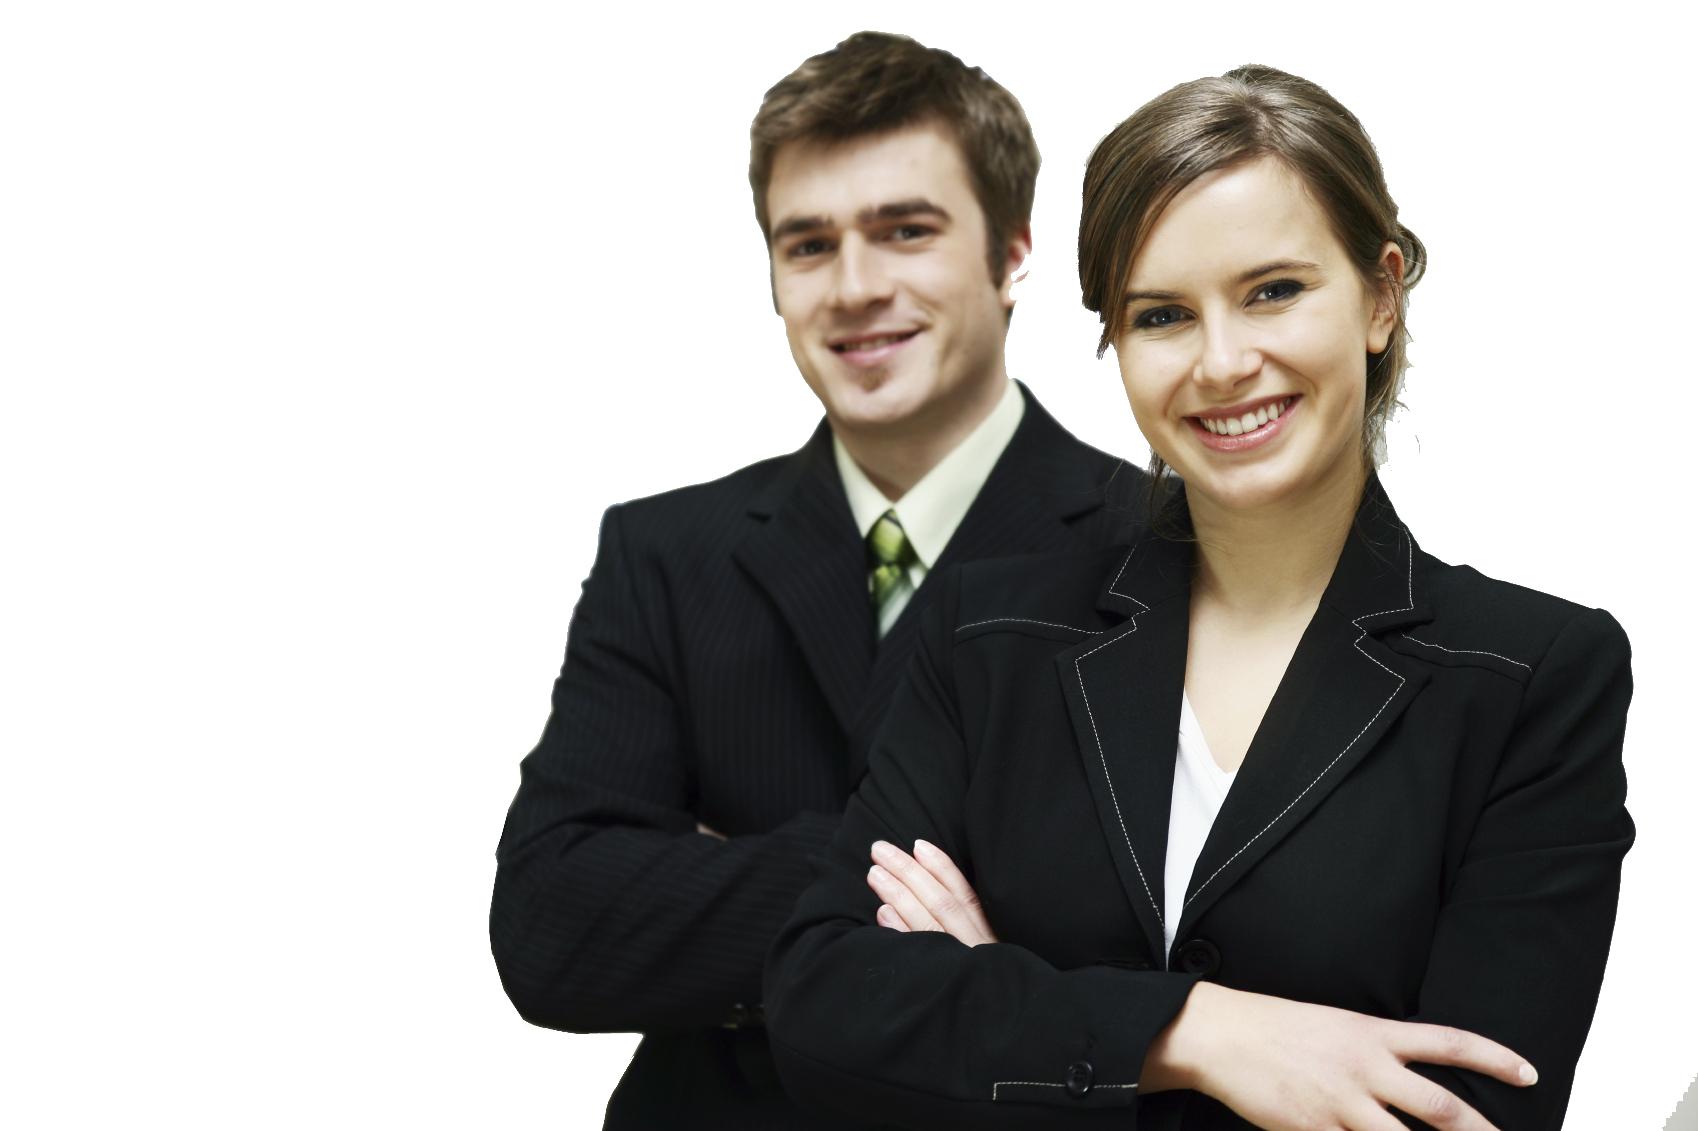 Professional clipart buisnessman. Business png transparent images